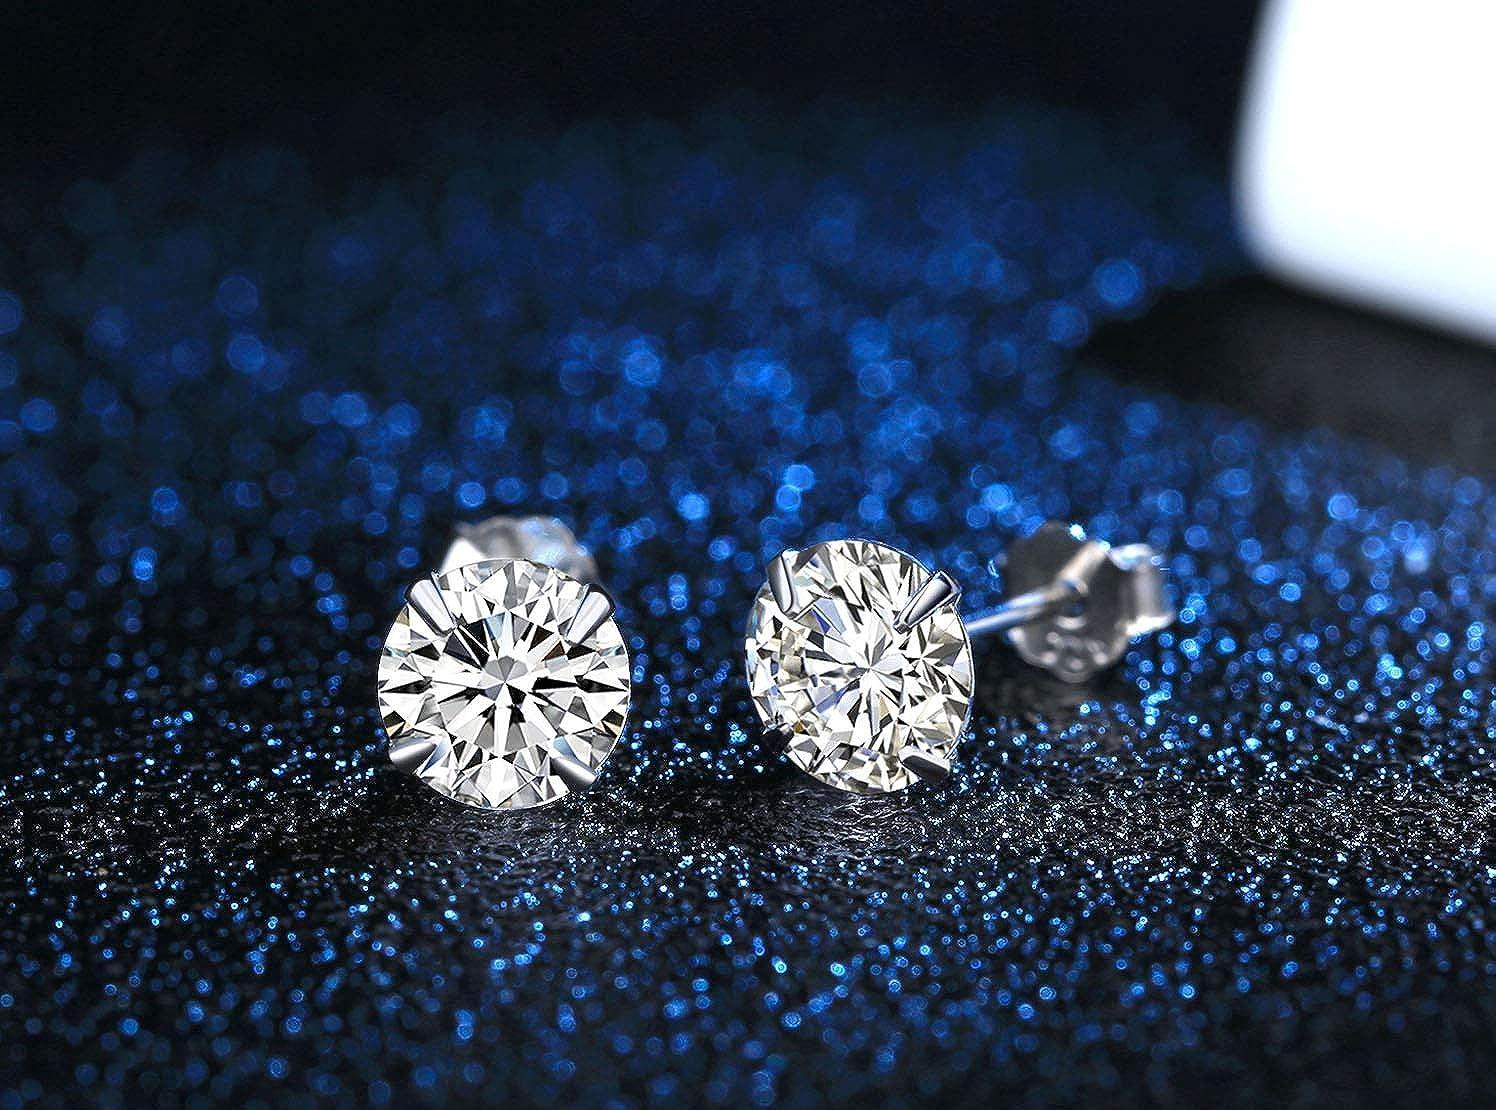 3-6 Pairs Round Clear Cubic Zirconia Stud Earrings for Sensitive Ears priercing /… Sterling Silver Studs Earrings